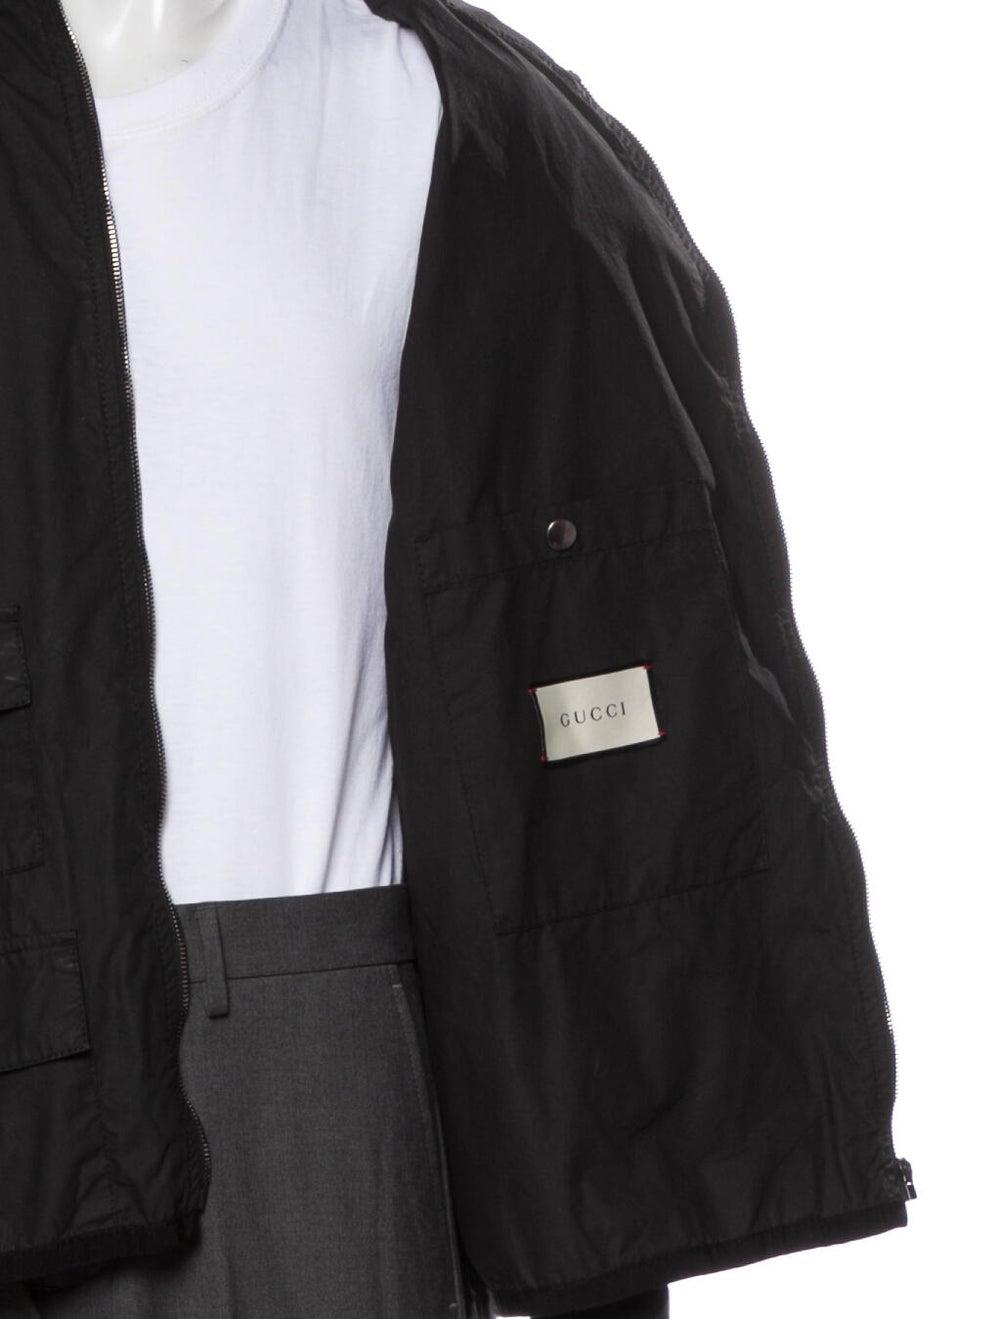 Gucci 2019 Bomber Jacket Black - image 4